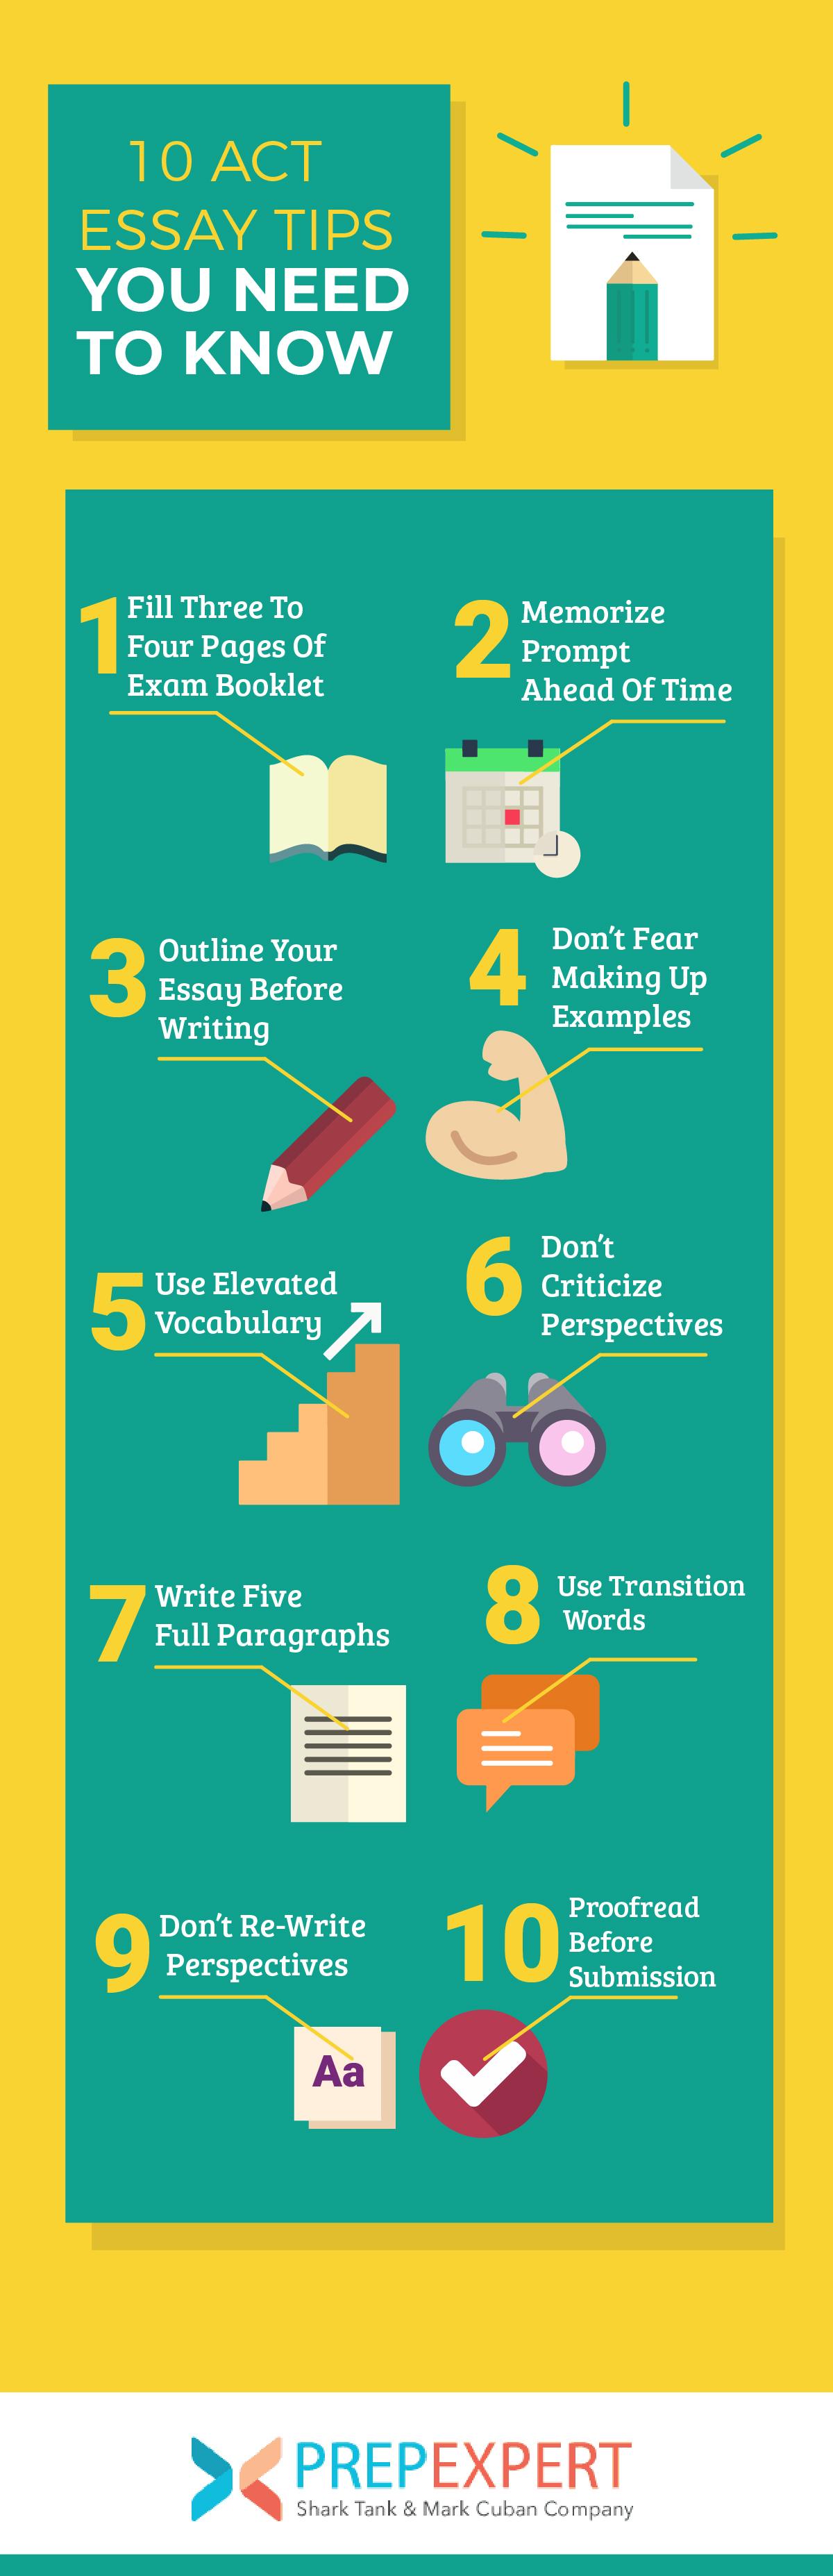 002 Essay Example Act Tips 235585 Essayinfographics 052918 Incredible Prepscholar Full